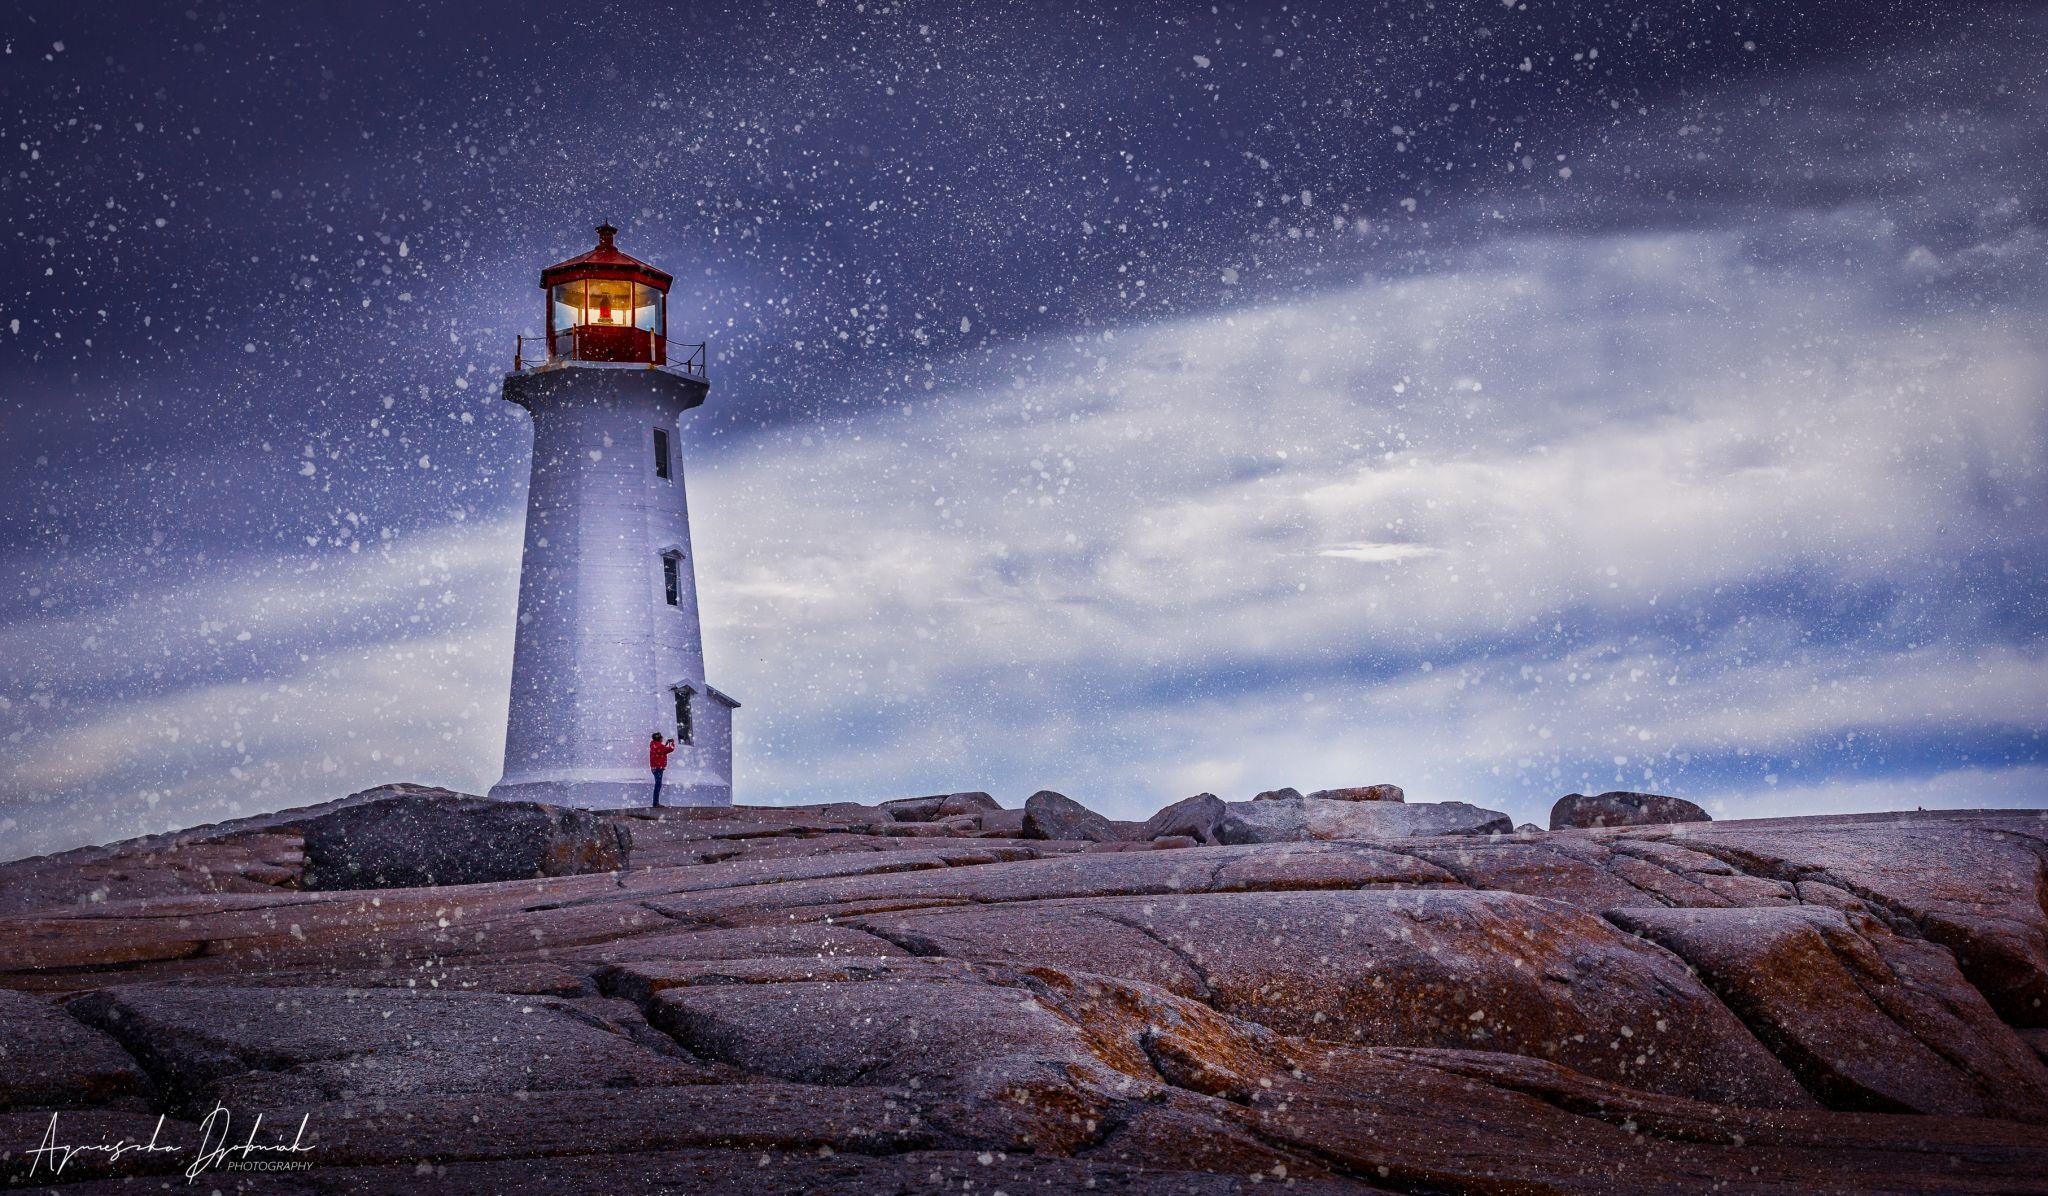 Peggy's Point Lighthouse, Canada